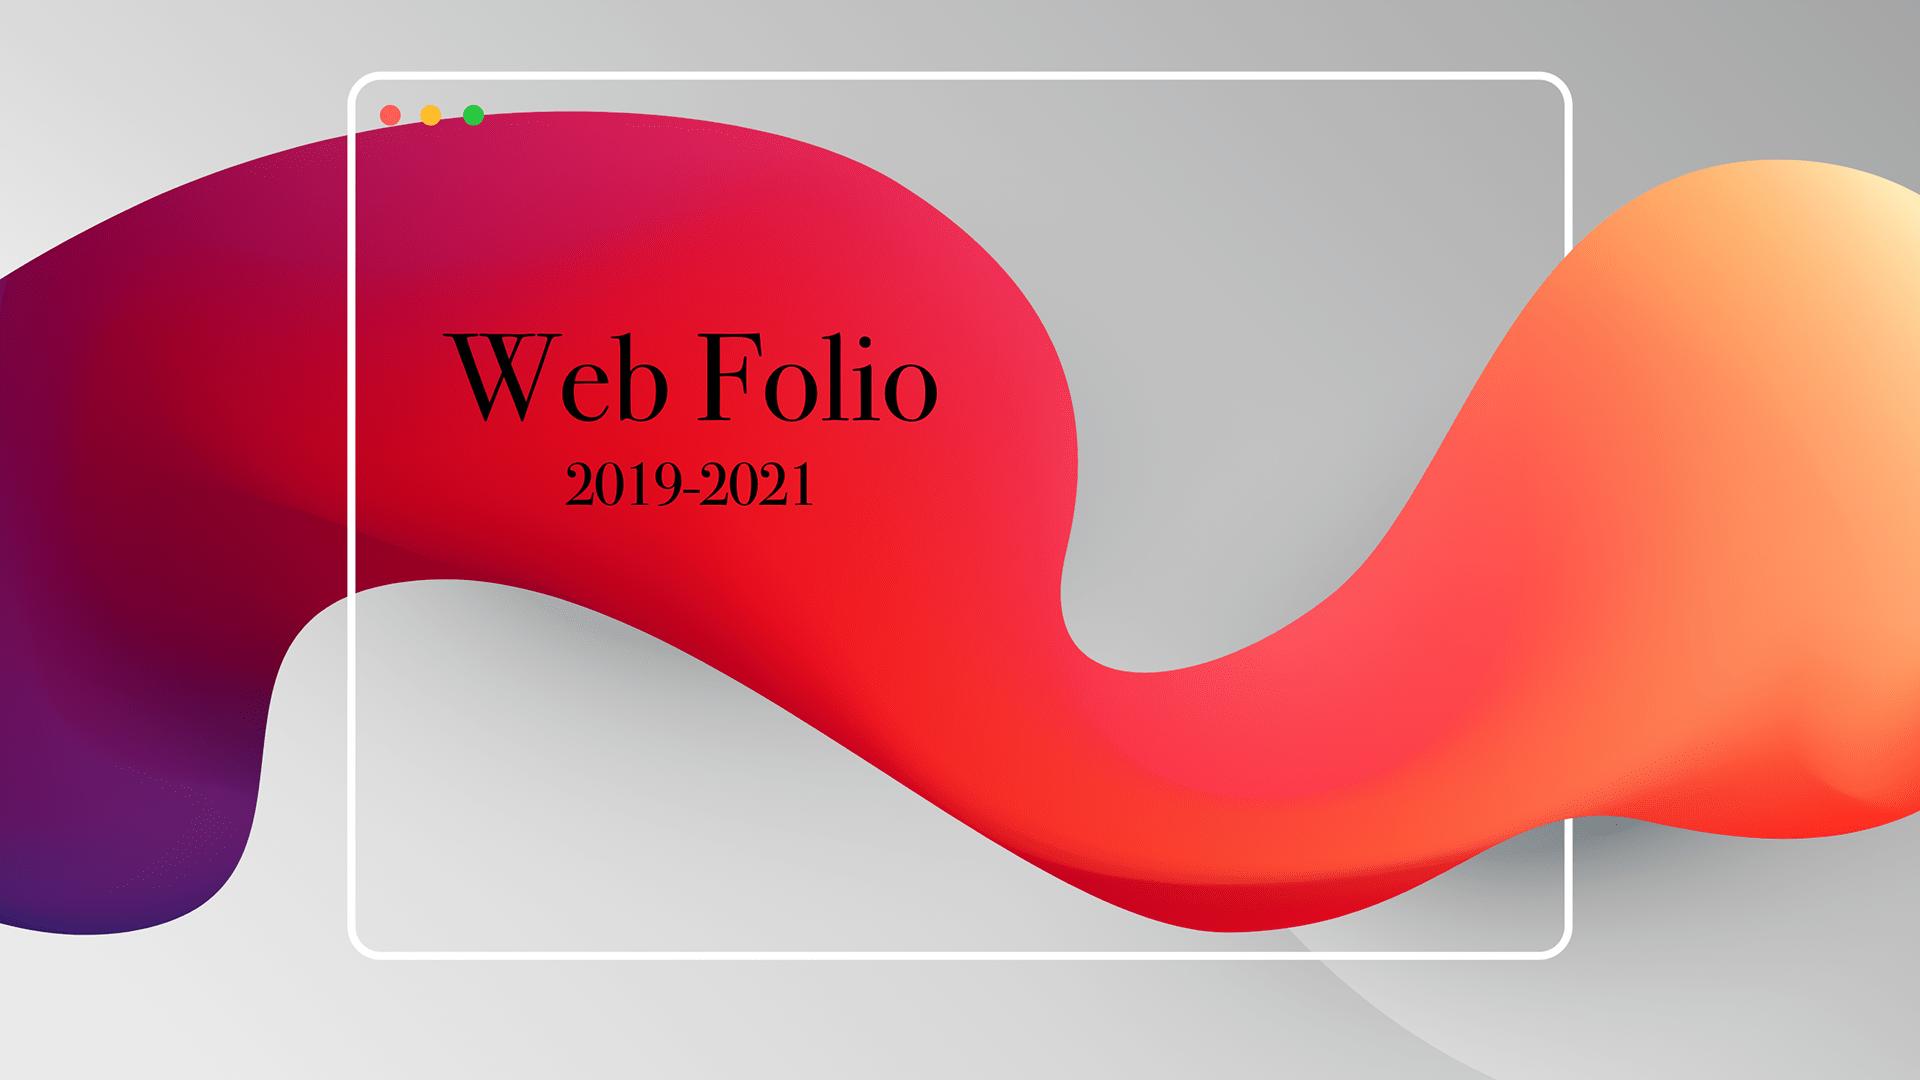 Web Folio 2019-2021